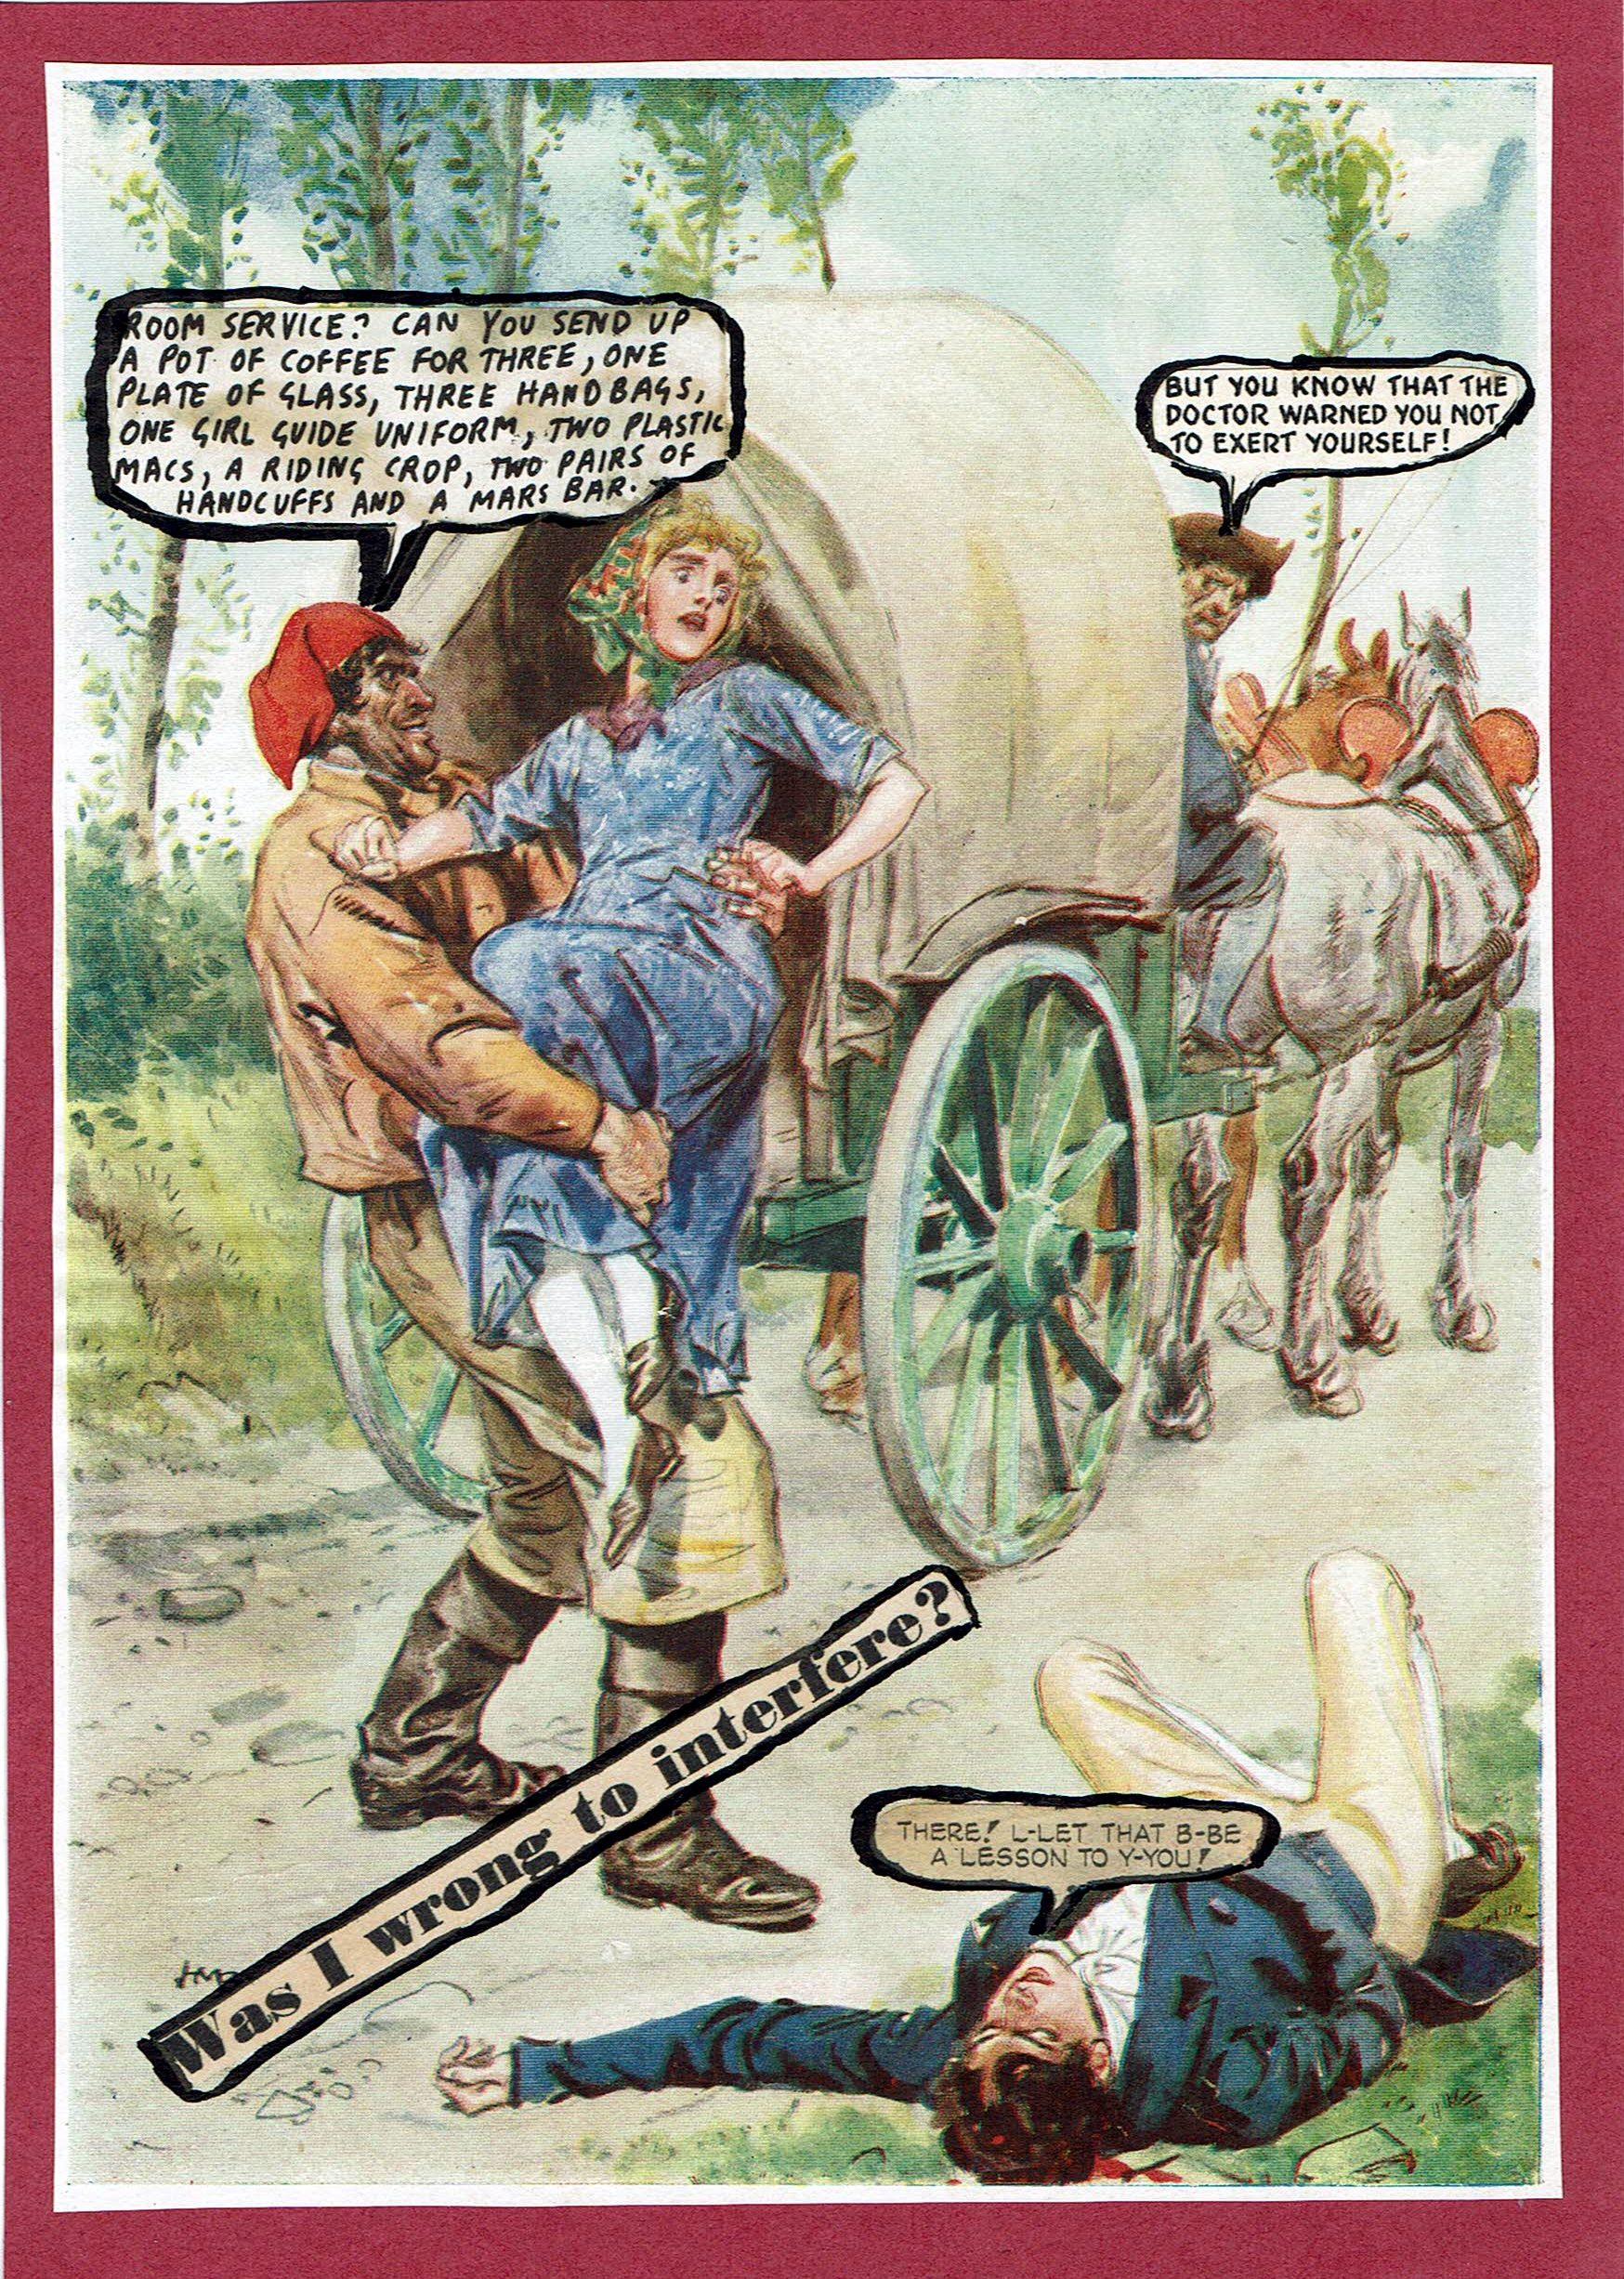 Wagon Jacking